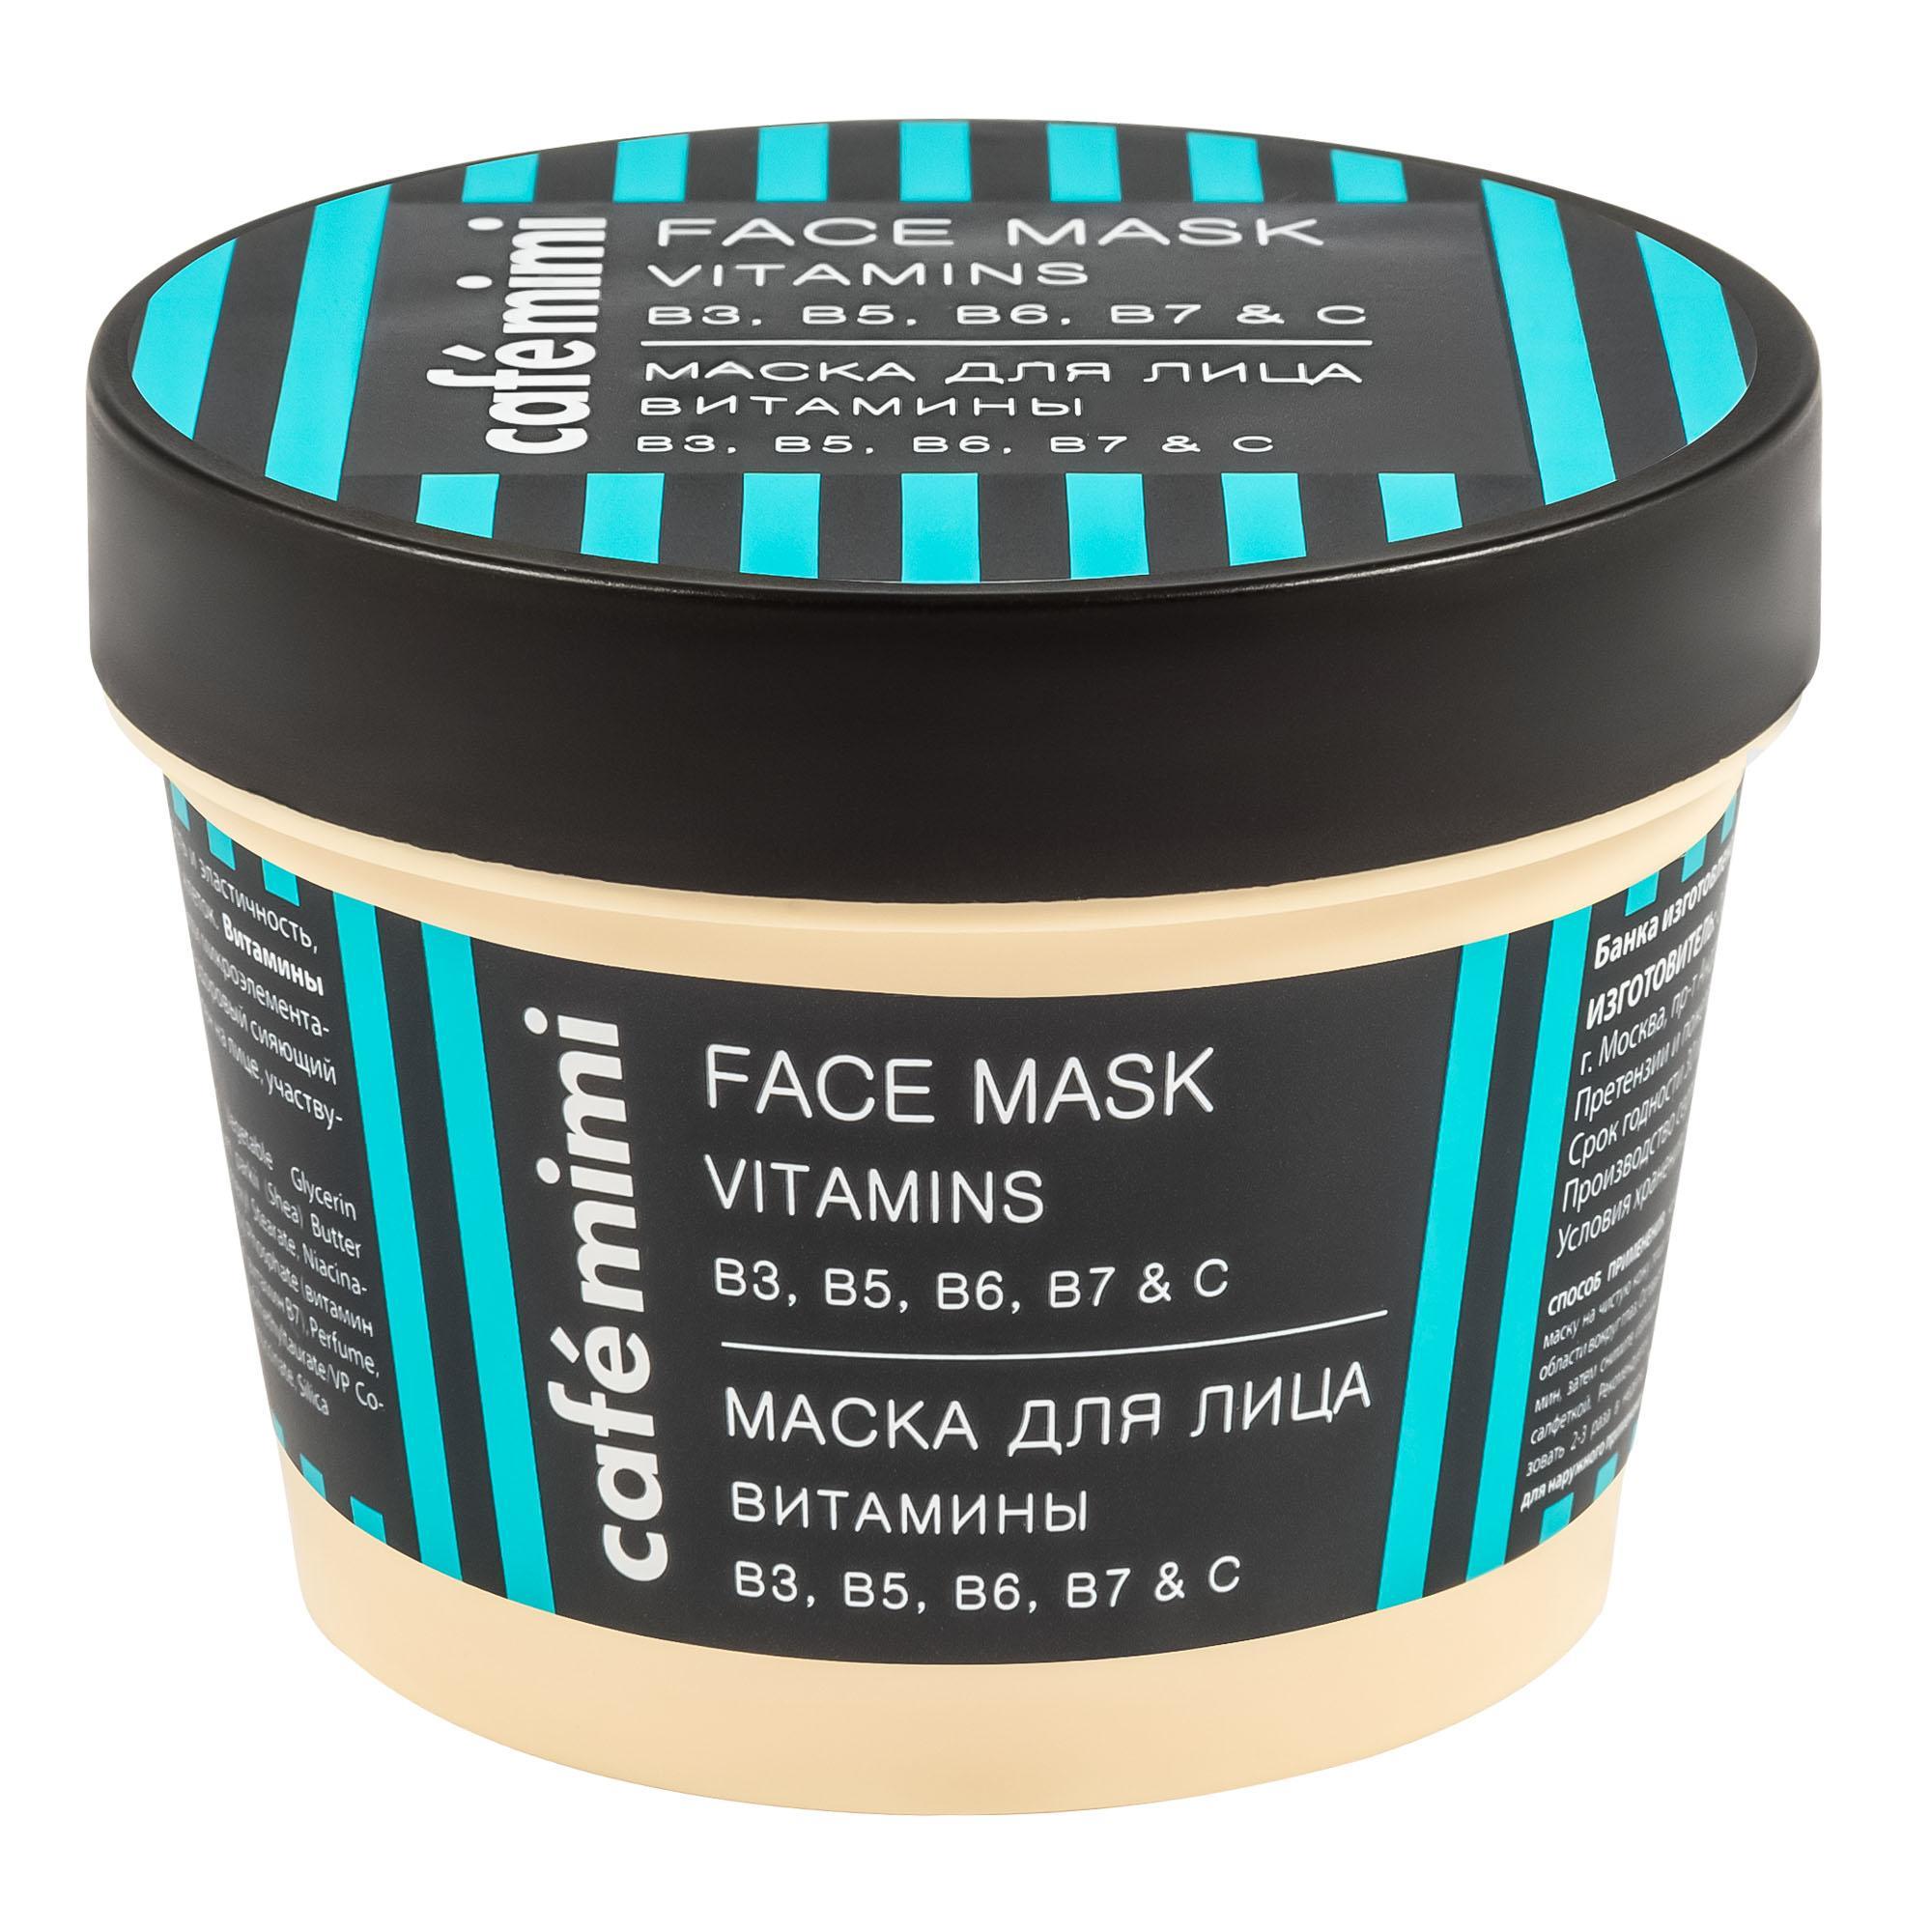 Café Mimi Mascarilla Facial Vitaminas  B3, B5, B6, B7 y C 110 ml